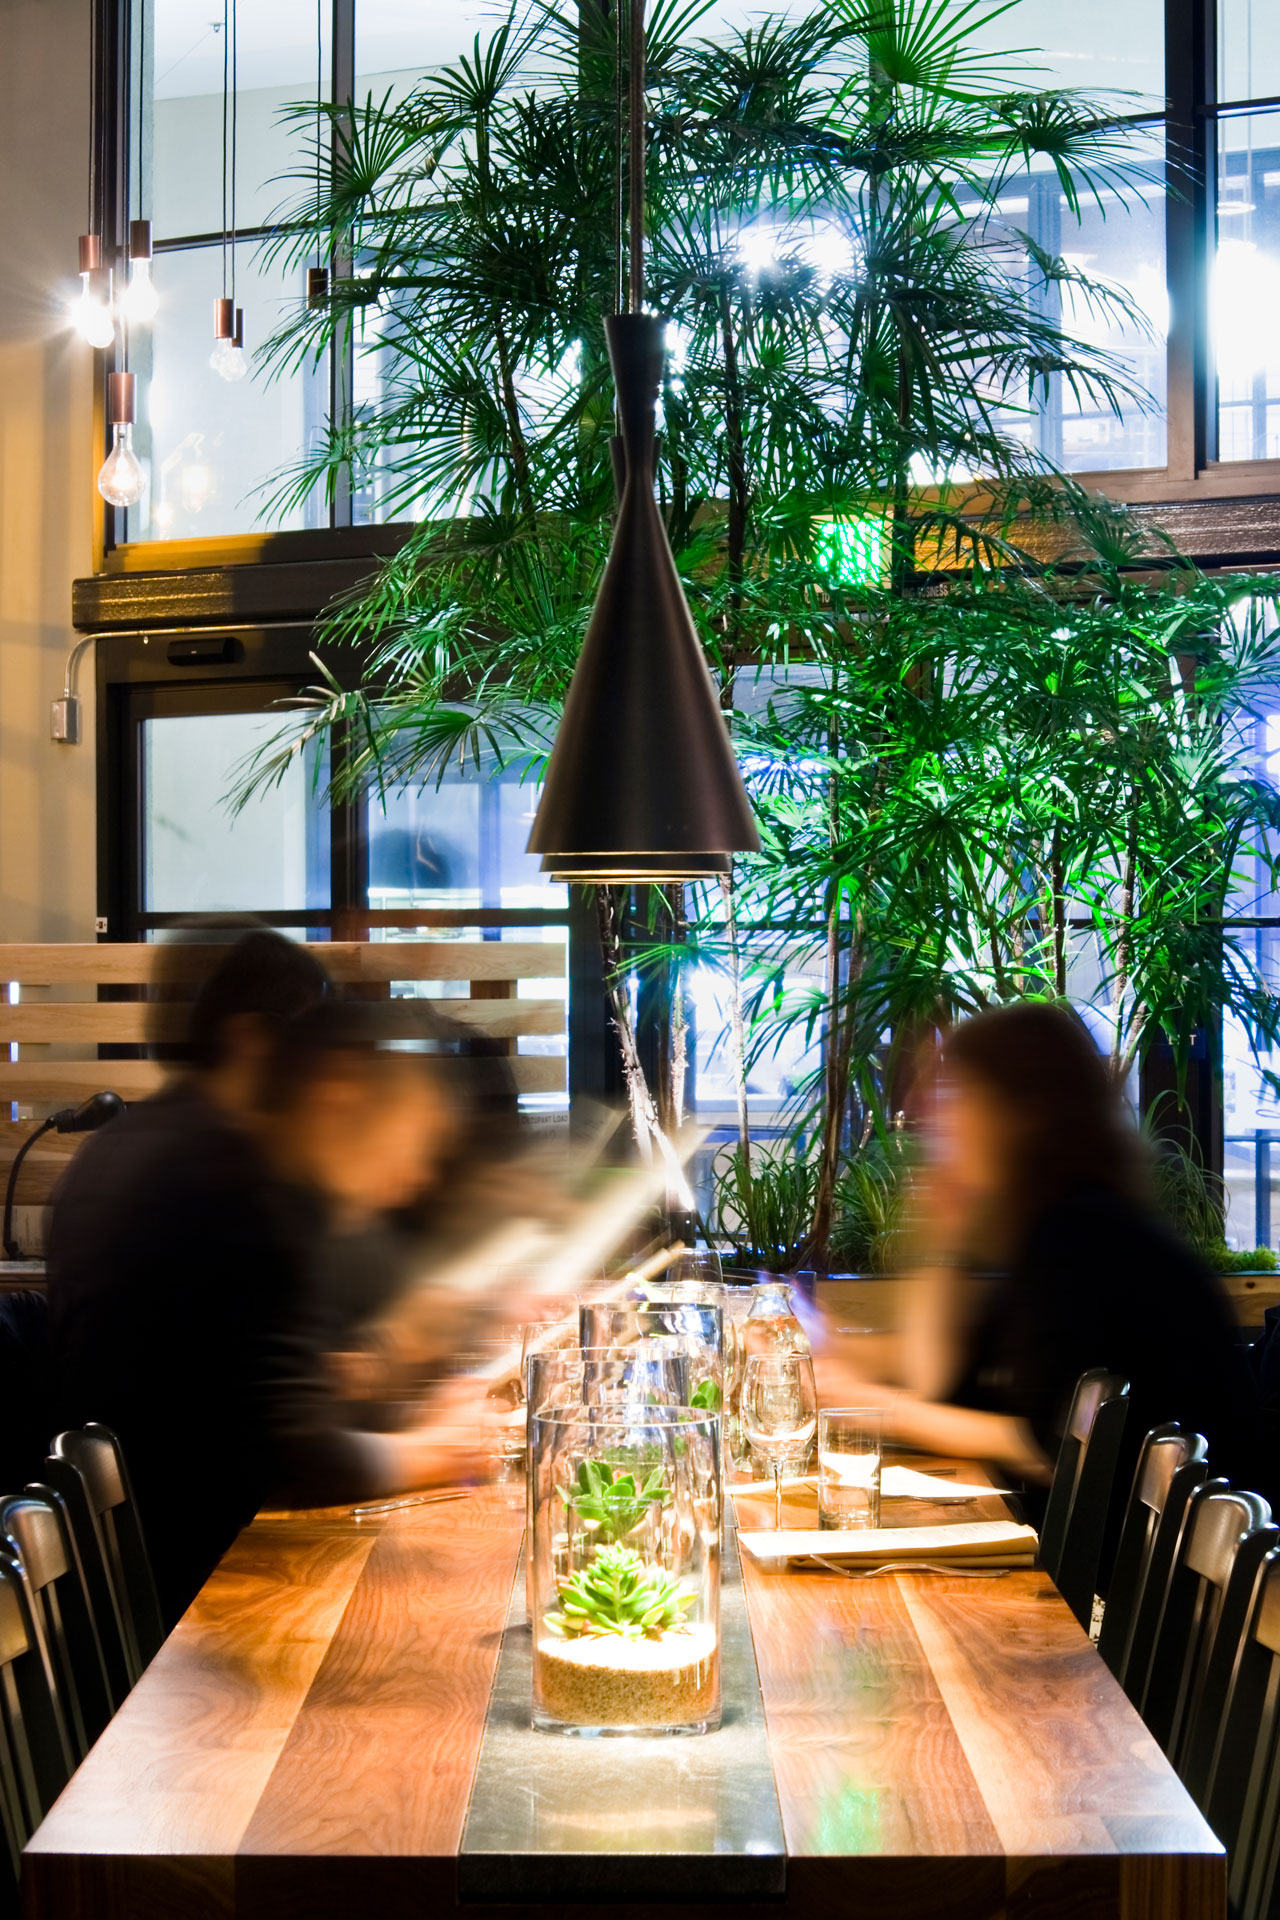 The Plant: Café Organic restaurant interiors